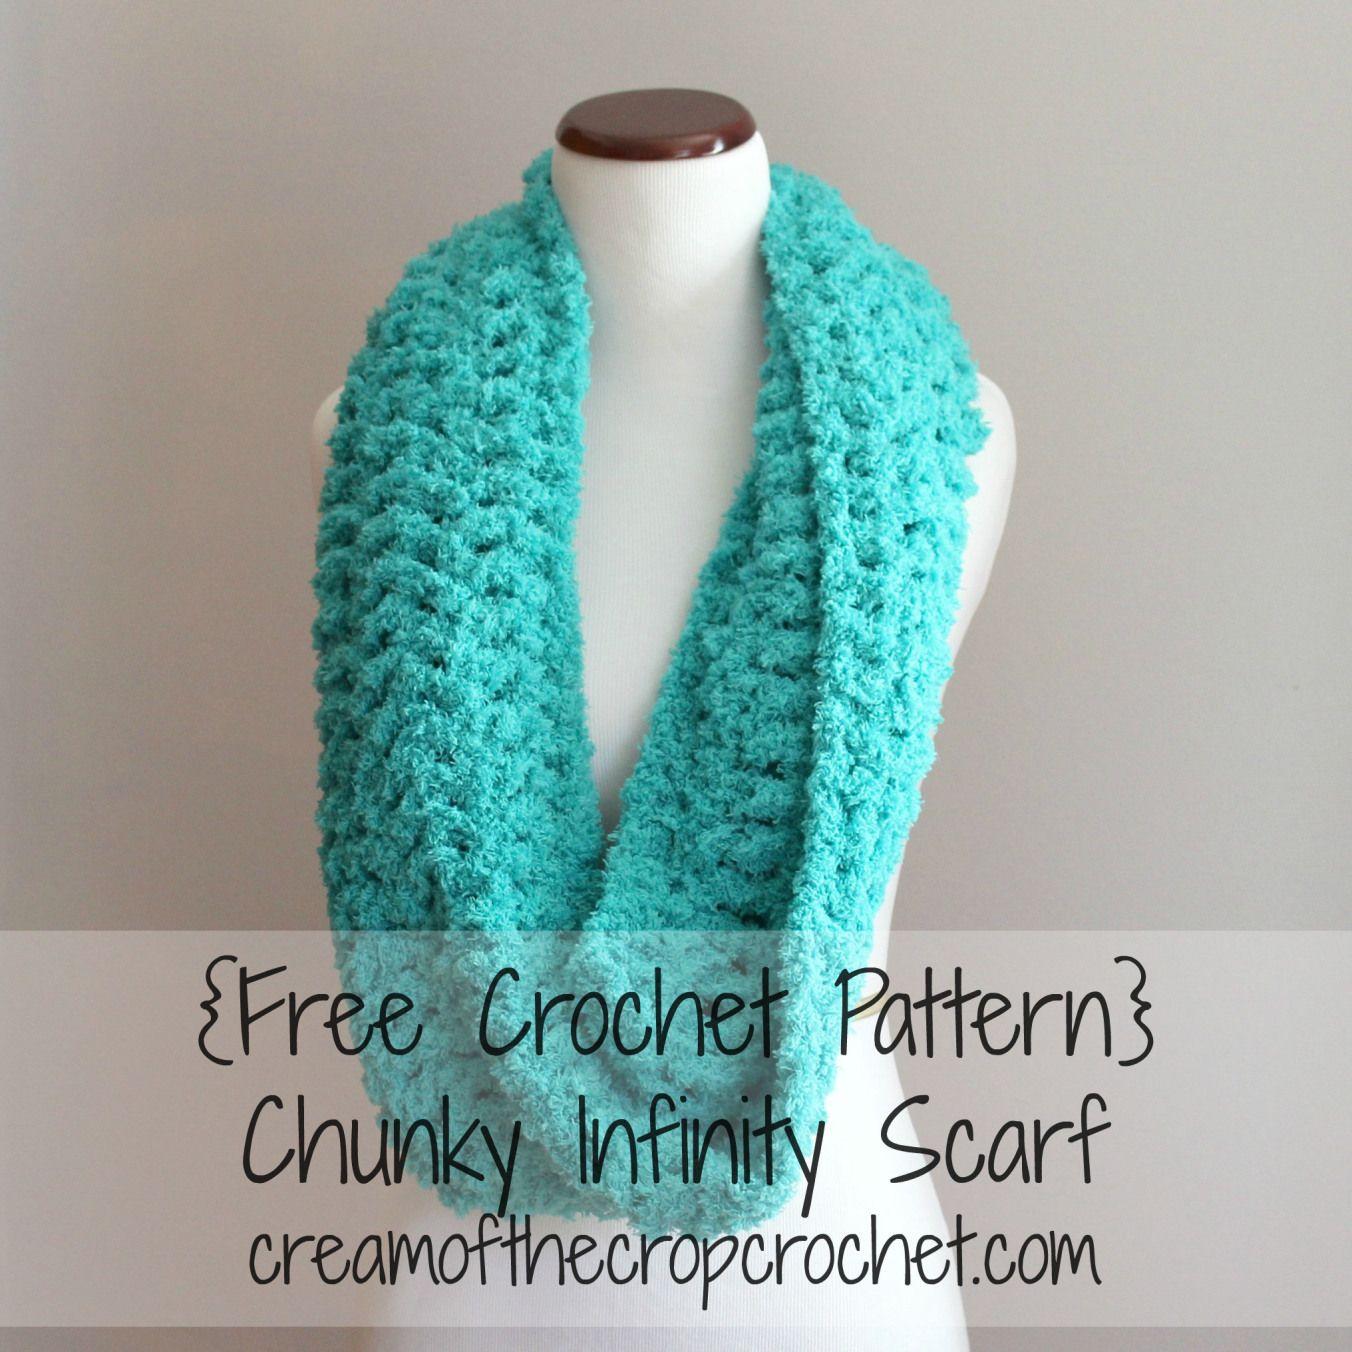 Chunky infinity scarf free crochet pattern cream of the crop chunky infinity scarf free crochet pattern cream of the crop crochet bankloansurffo Choice Image